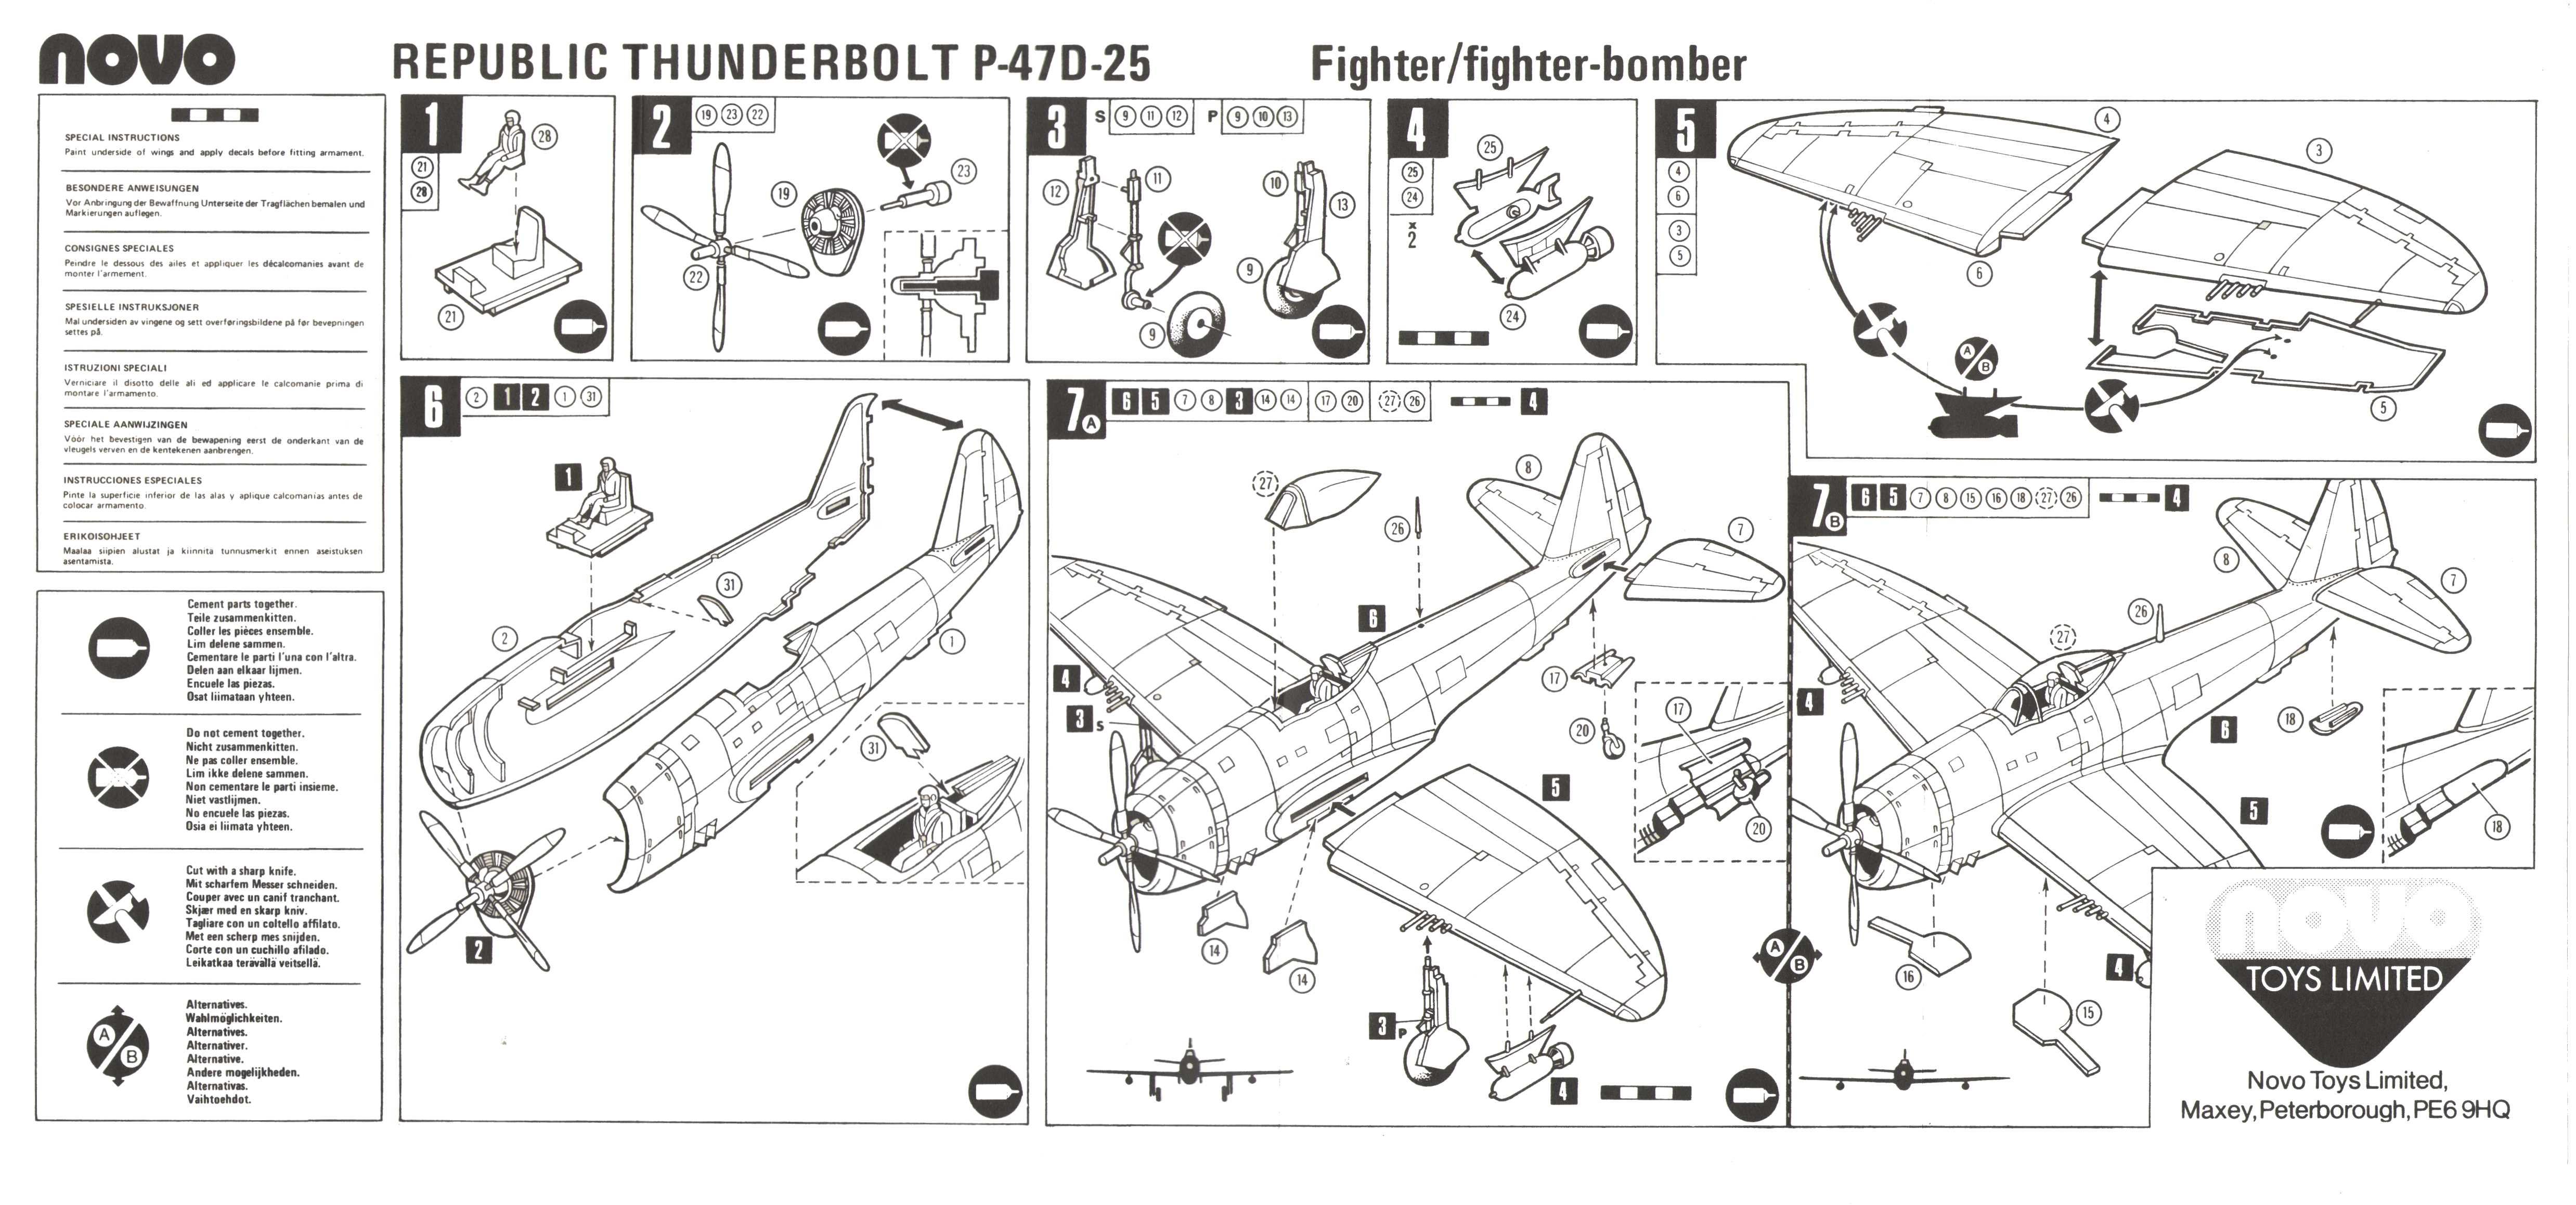 Инструкция NOVO F183 Thunderbolt - Fighter Bomber